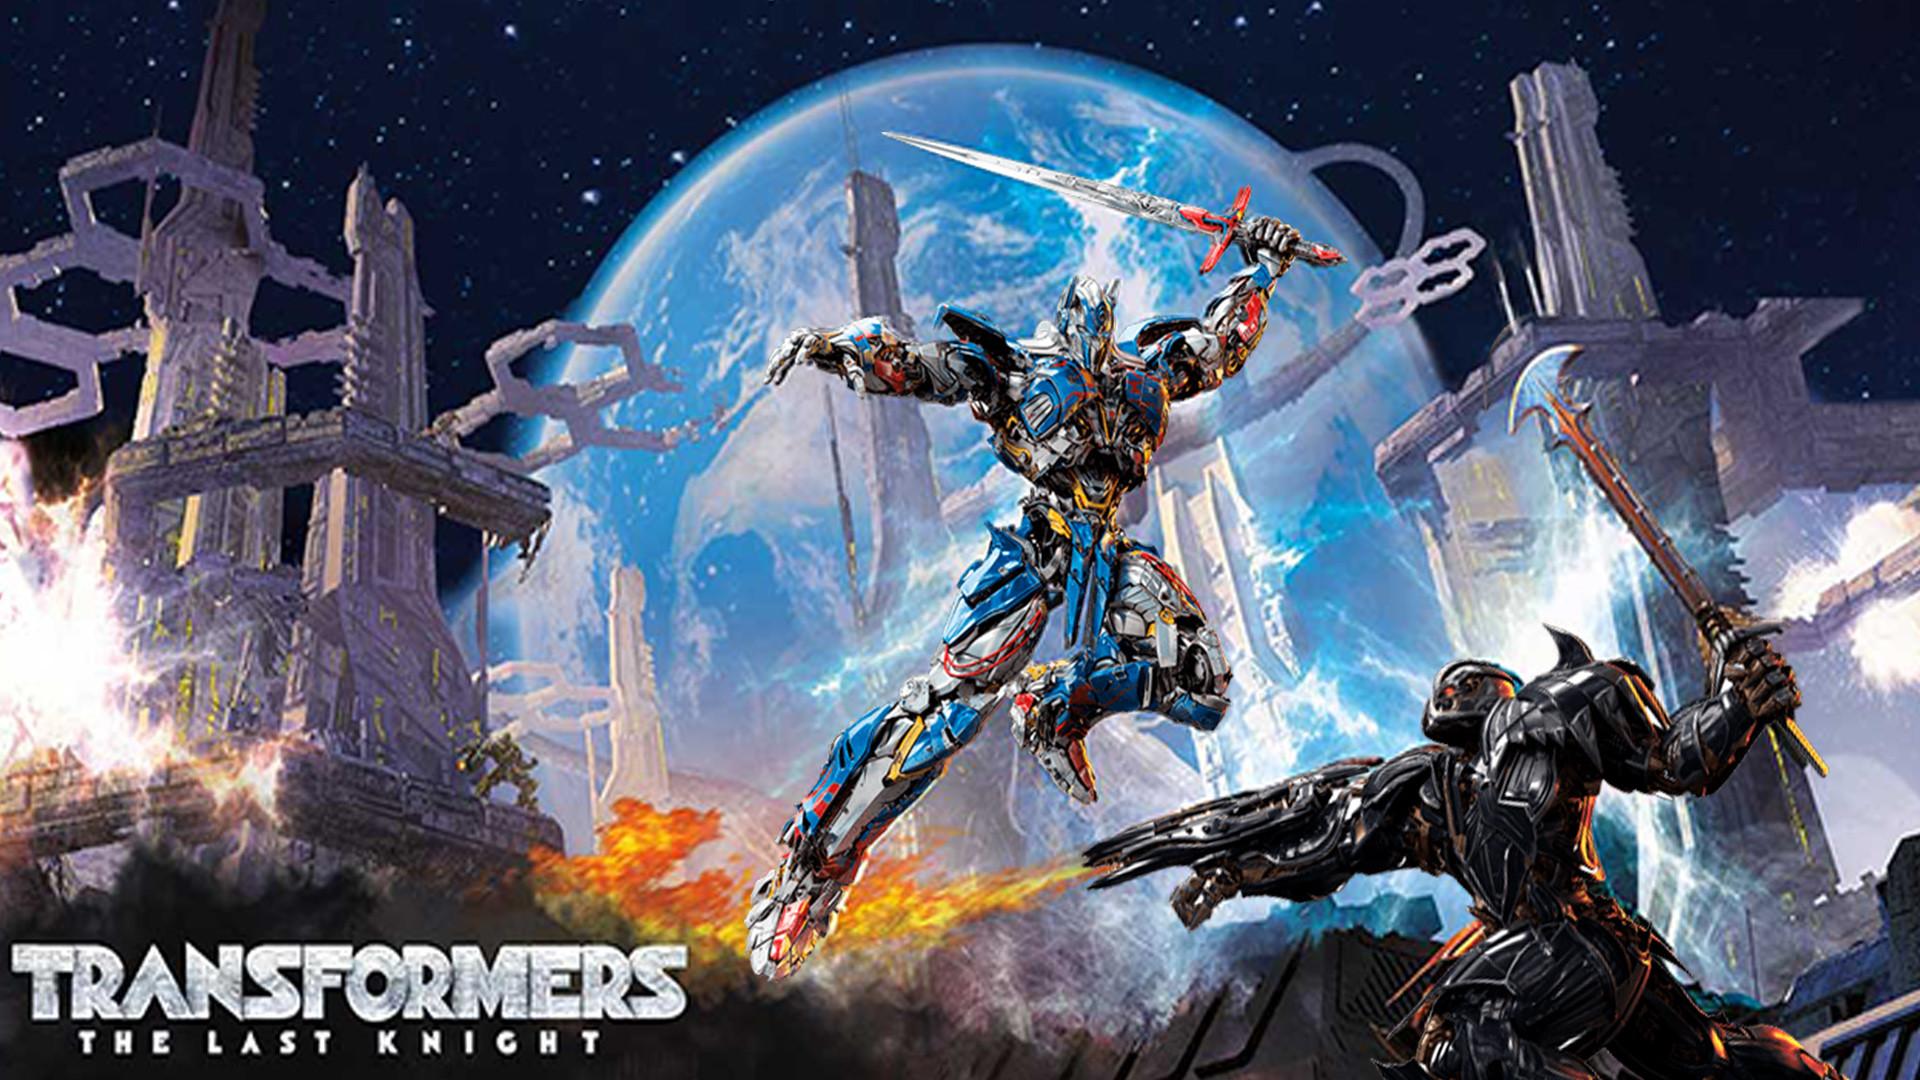 Optimus Prime Vs Megatron Wallpaper 66 Images